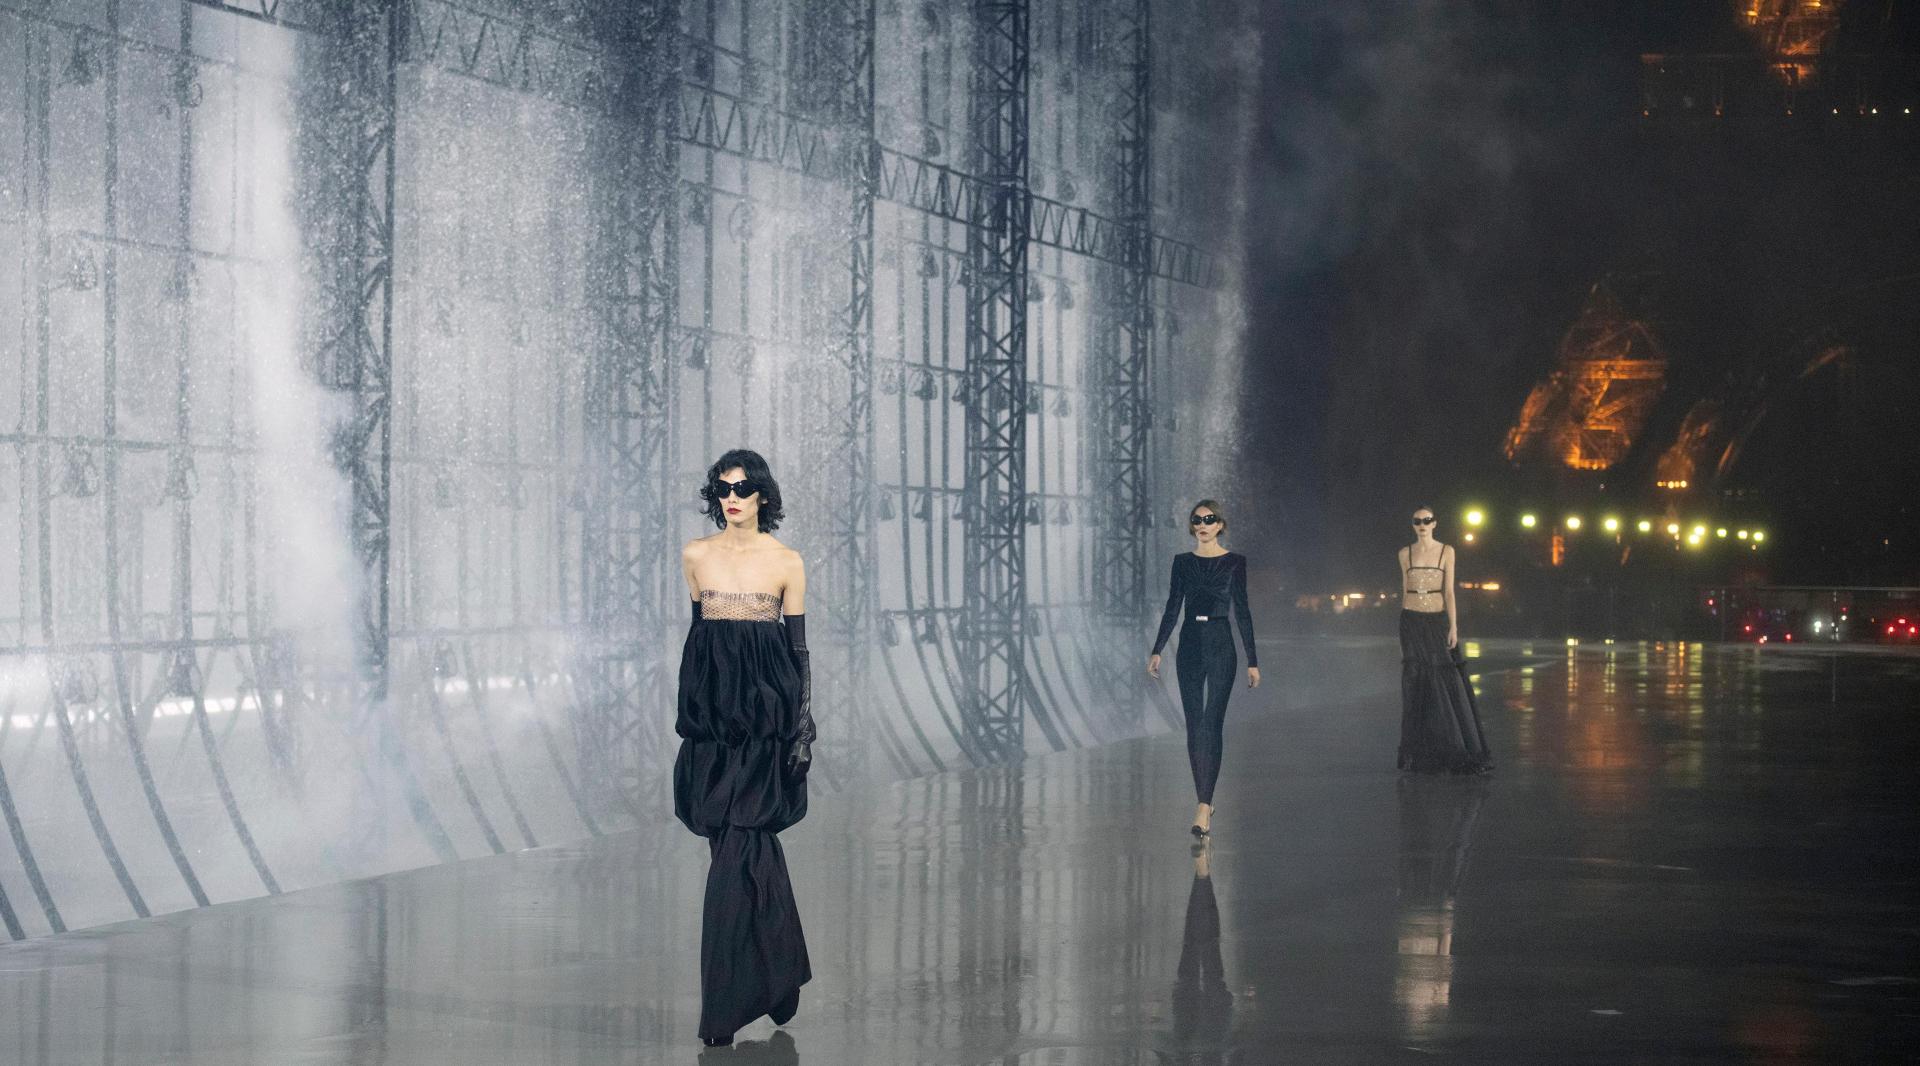 Pasarelas de Fashion Week